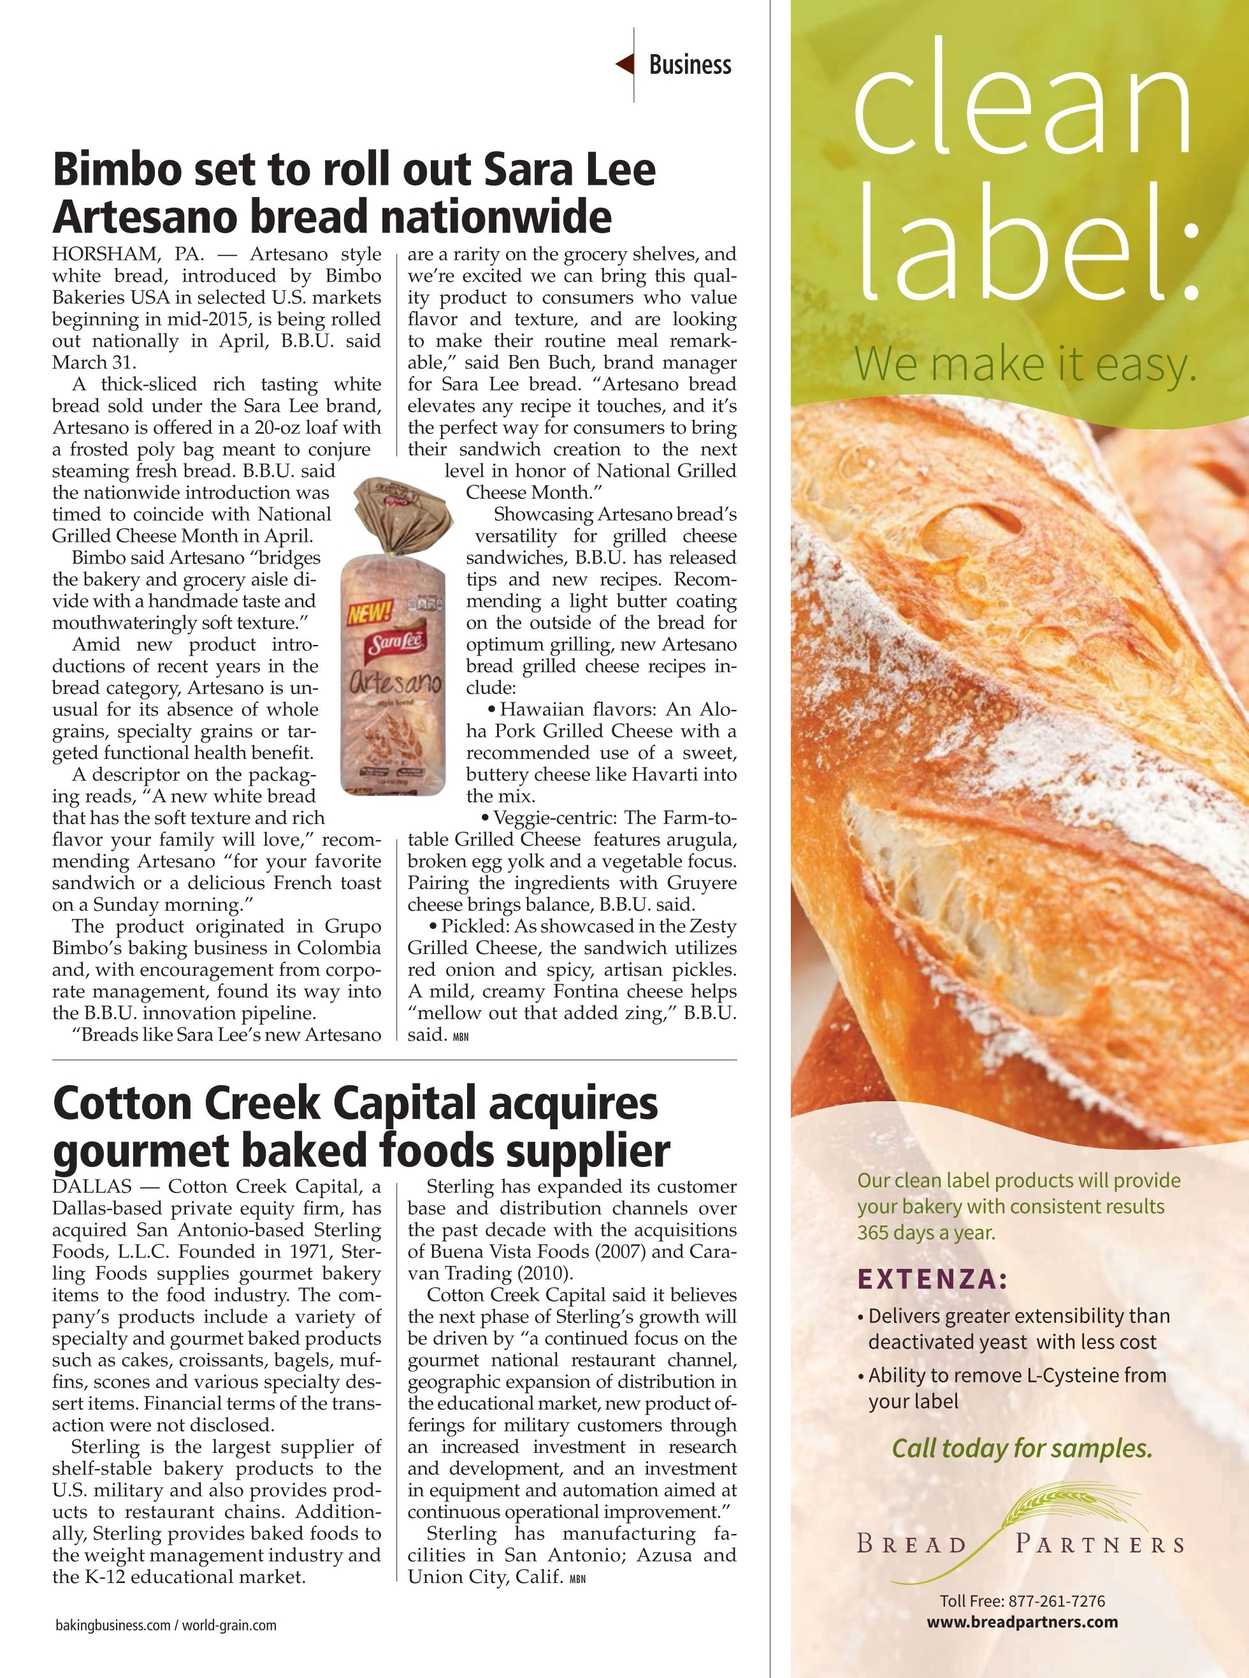 Milling & Baking News - April 12, 2016